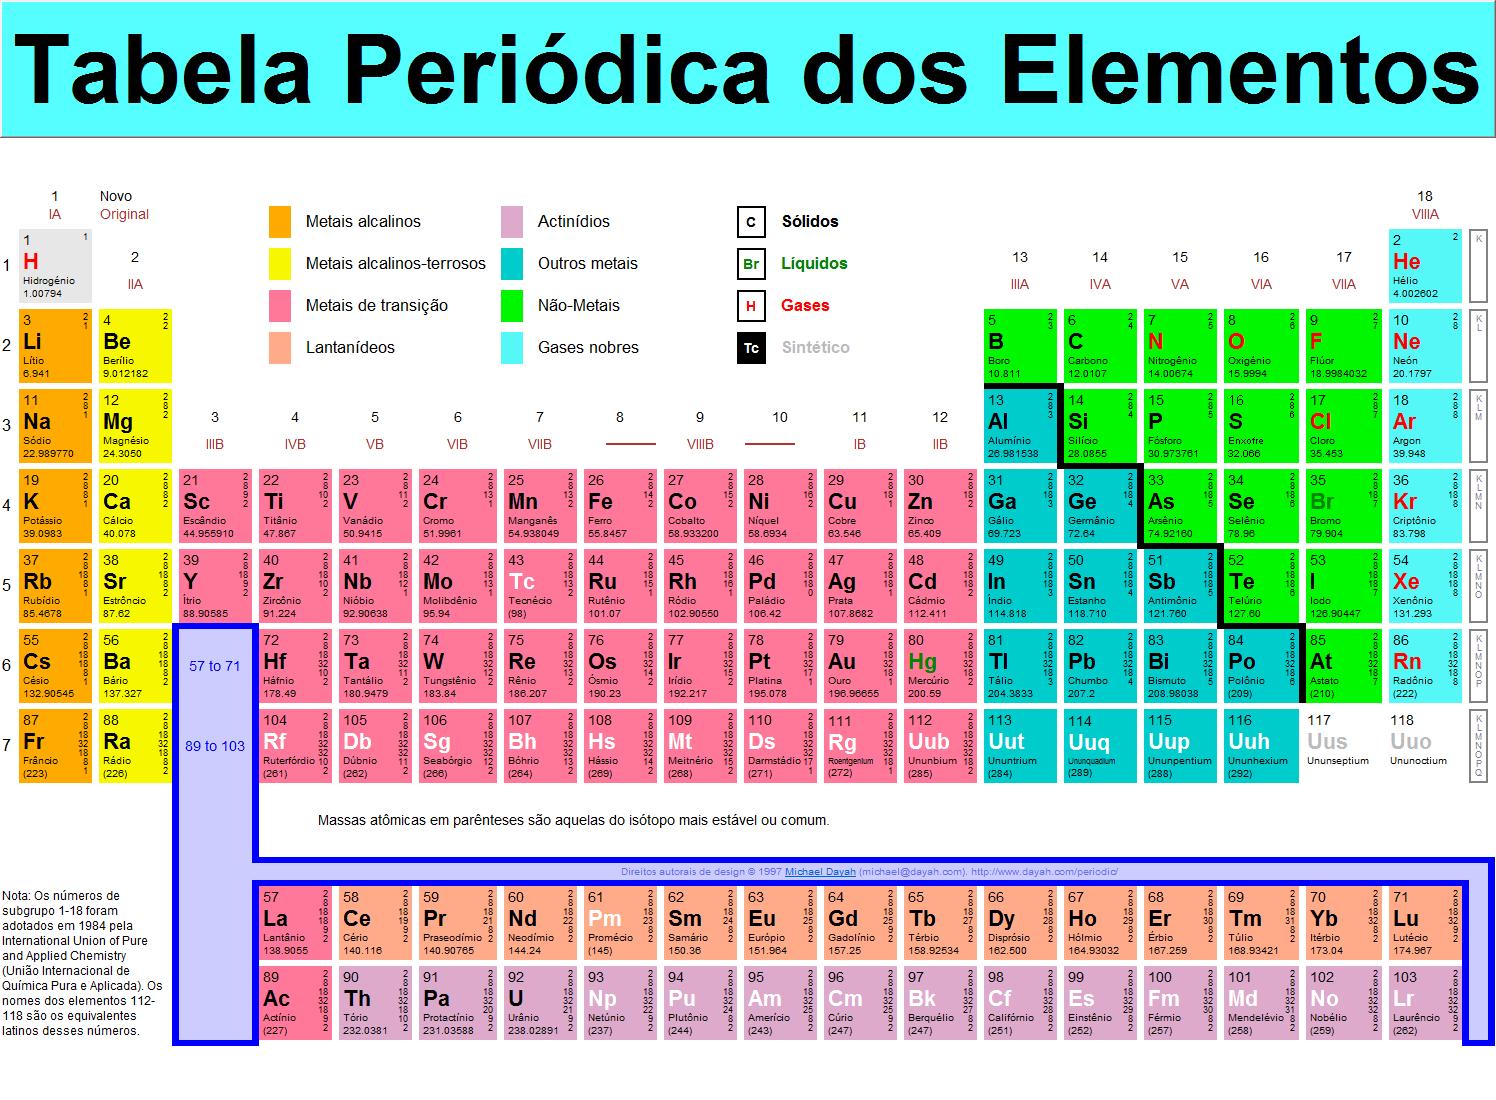 http://www.clickescolar.com.br/wp-content/uploads/2010/03/tabela-periodica.png